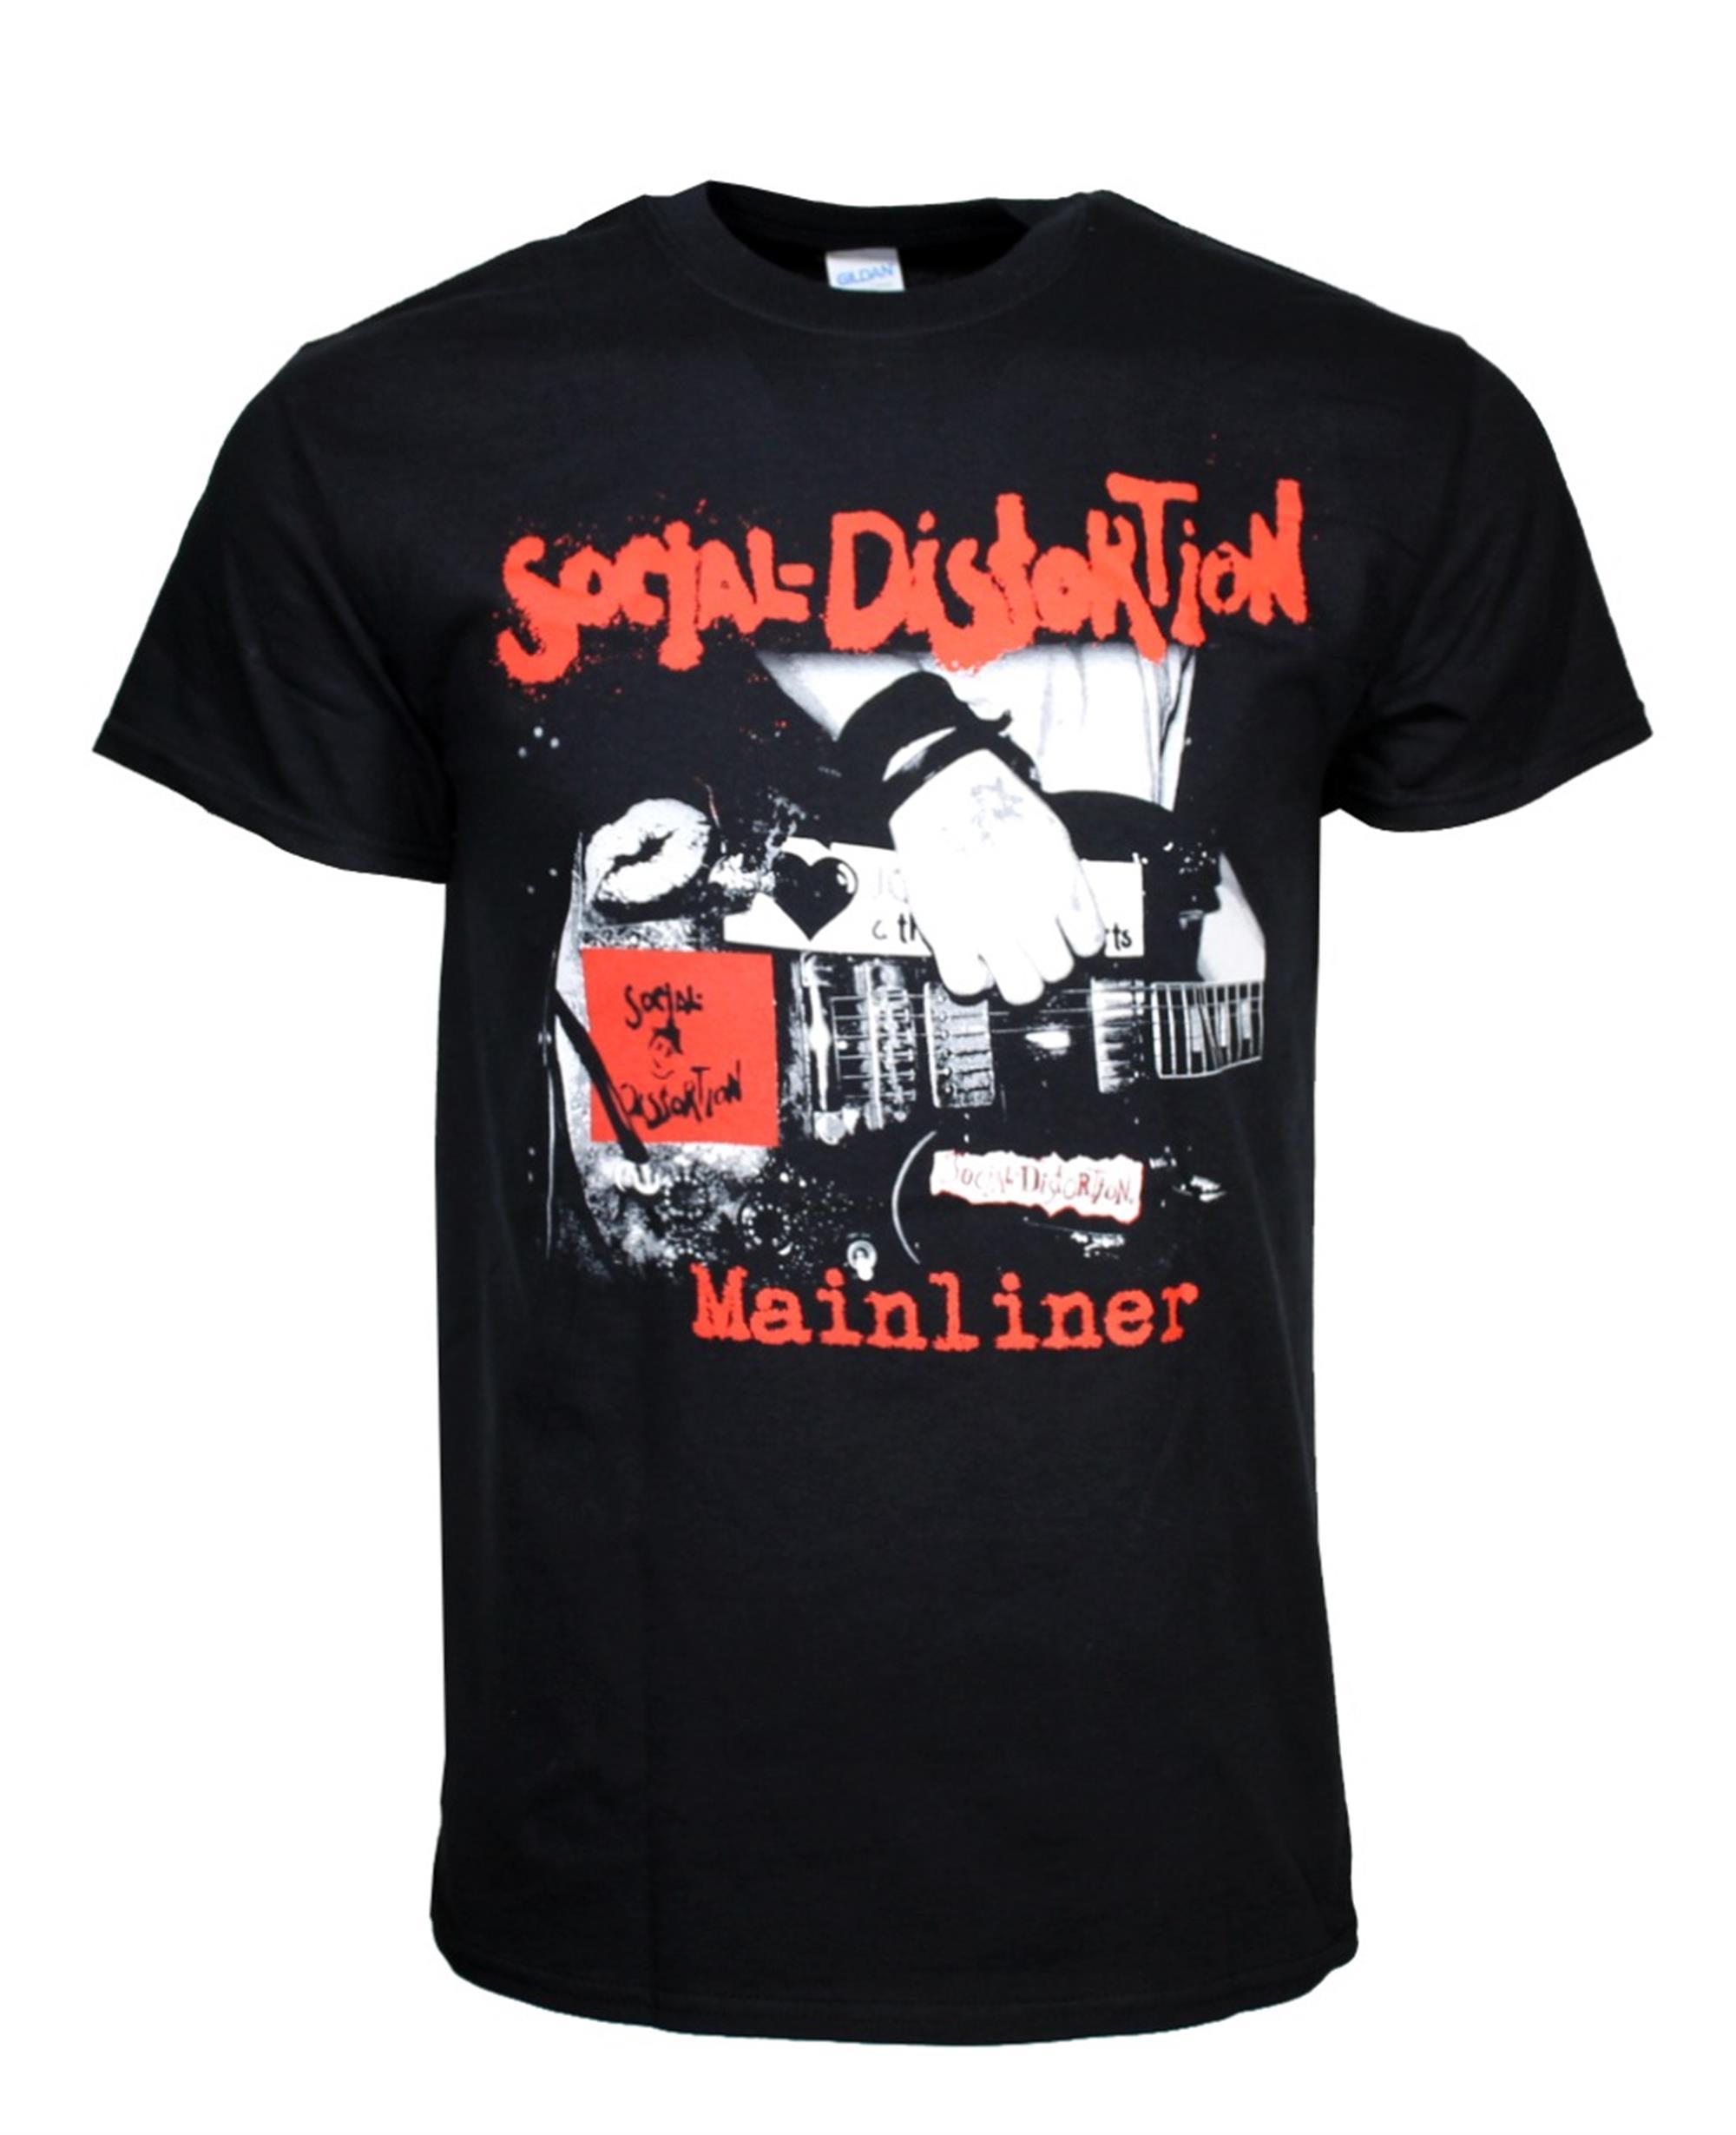 Social Distortion Mainliner Album T-Shirt